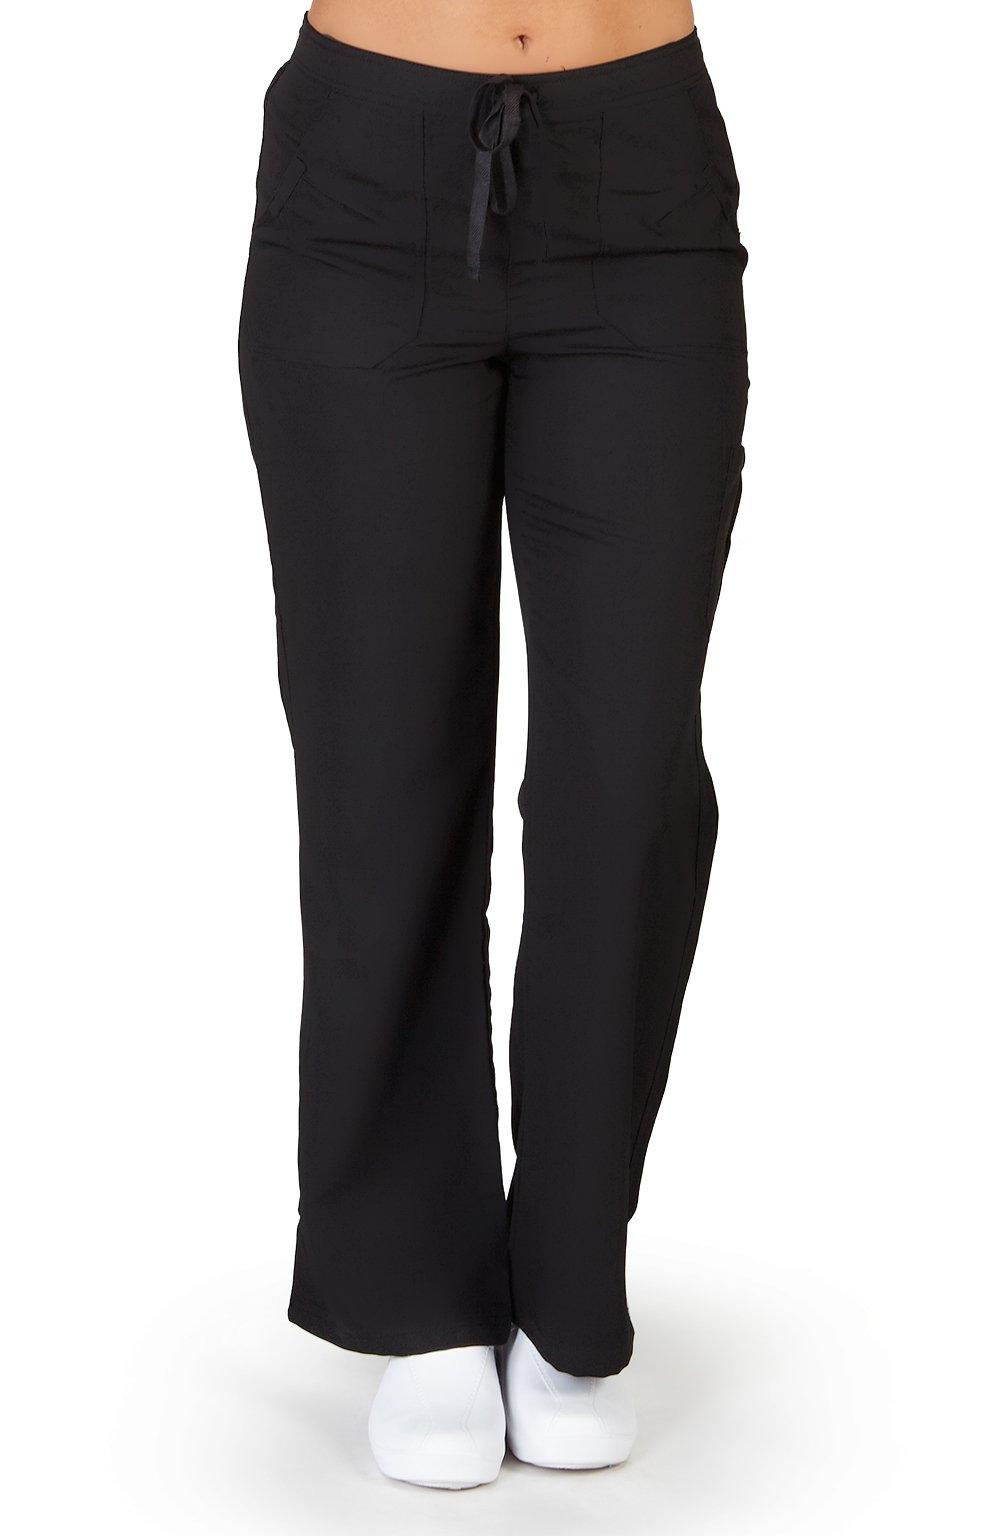 Ultra Soft Brand Scrubs - Premium Womens Junior Fit Cargo Pocket Scrub Pant, Black 36170-XX-Small